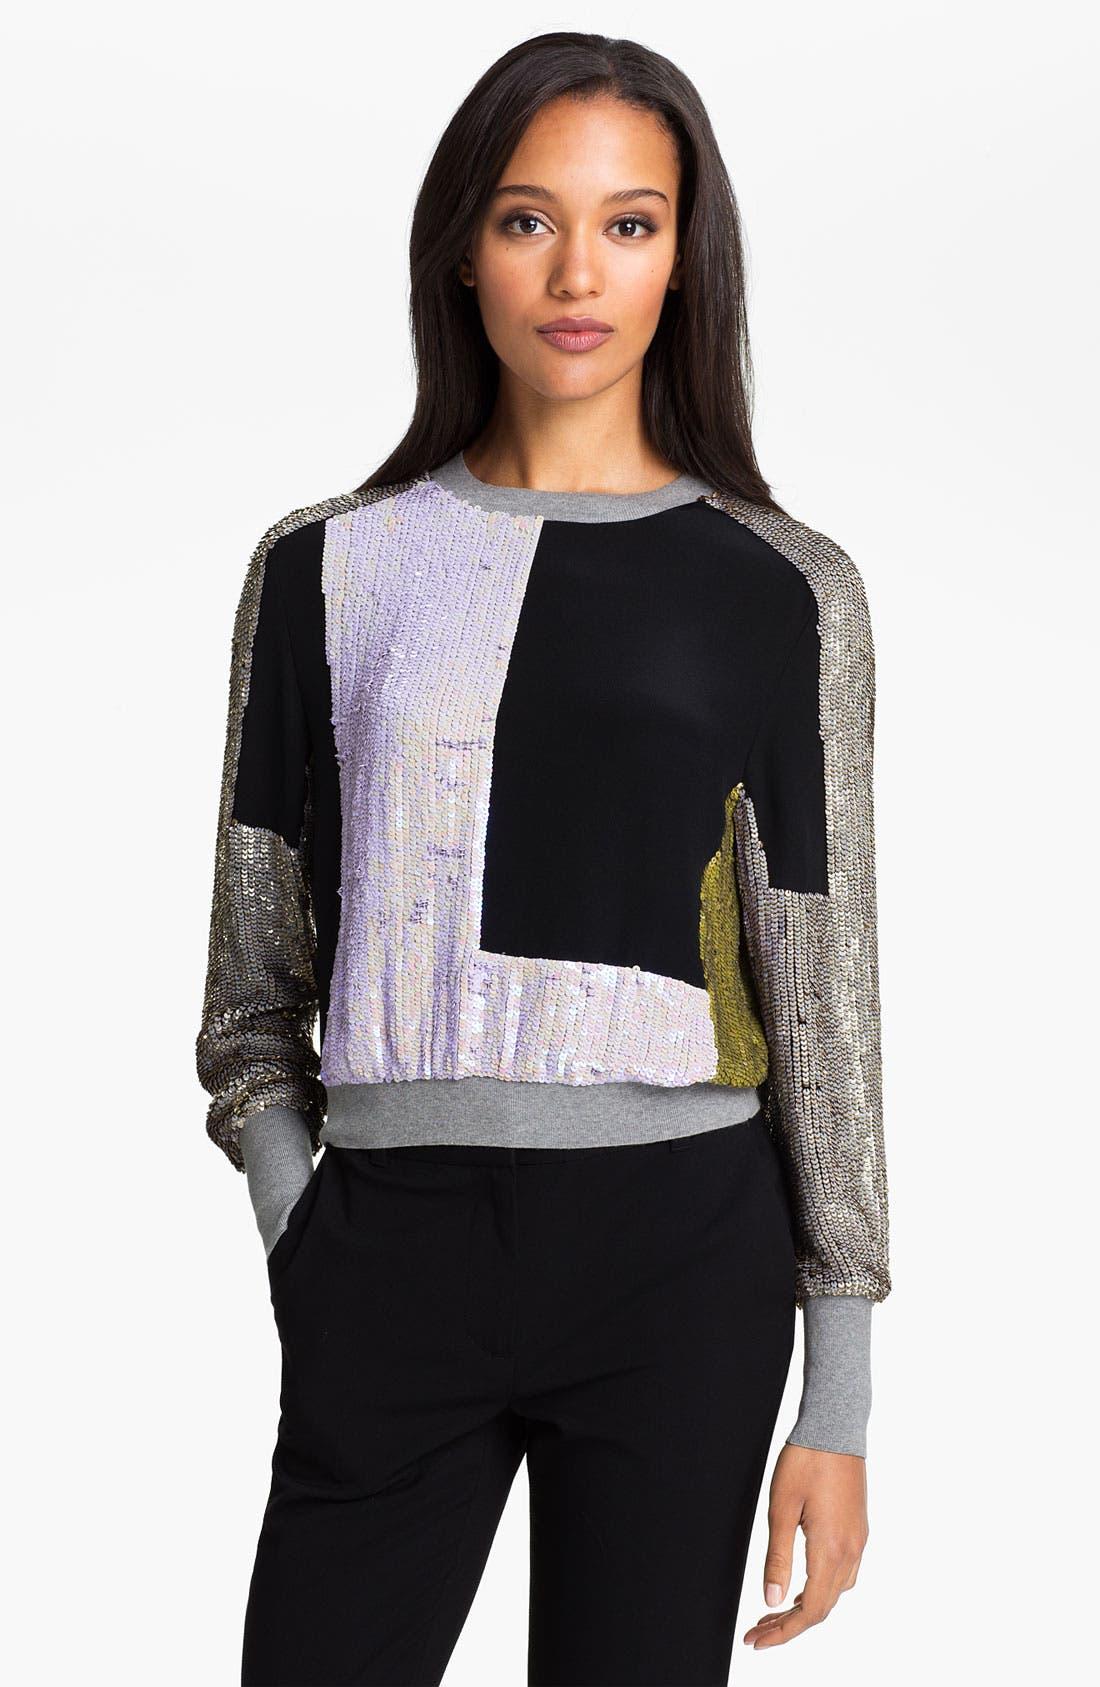 Alternate Image 1 Selected - 3.1 Phillip Lim Patchwork Sequin Sweater